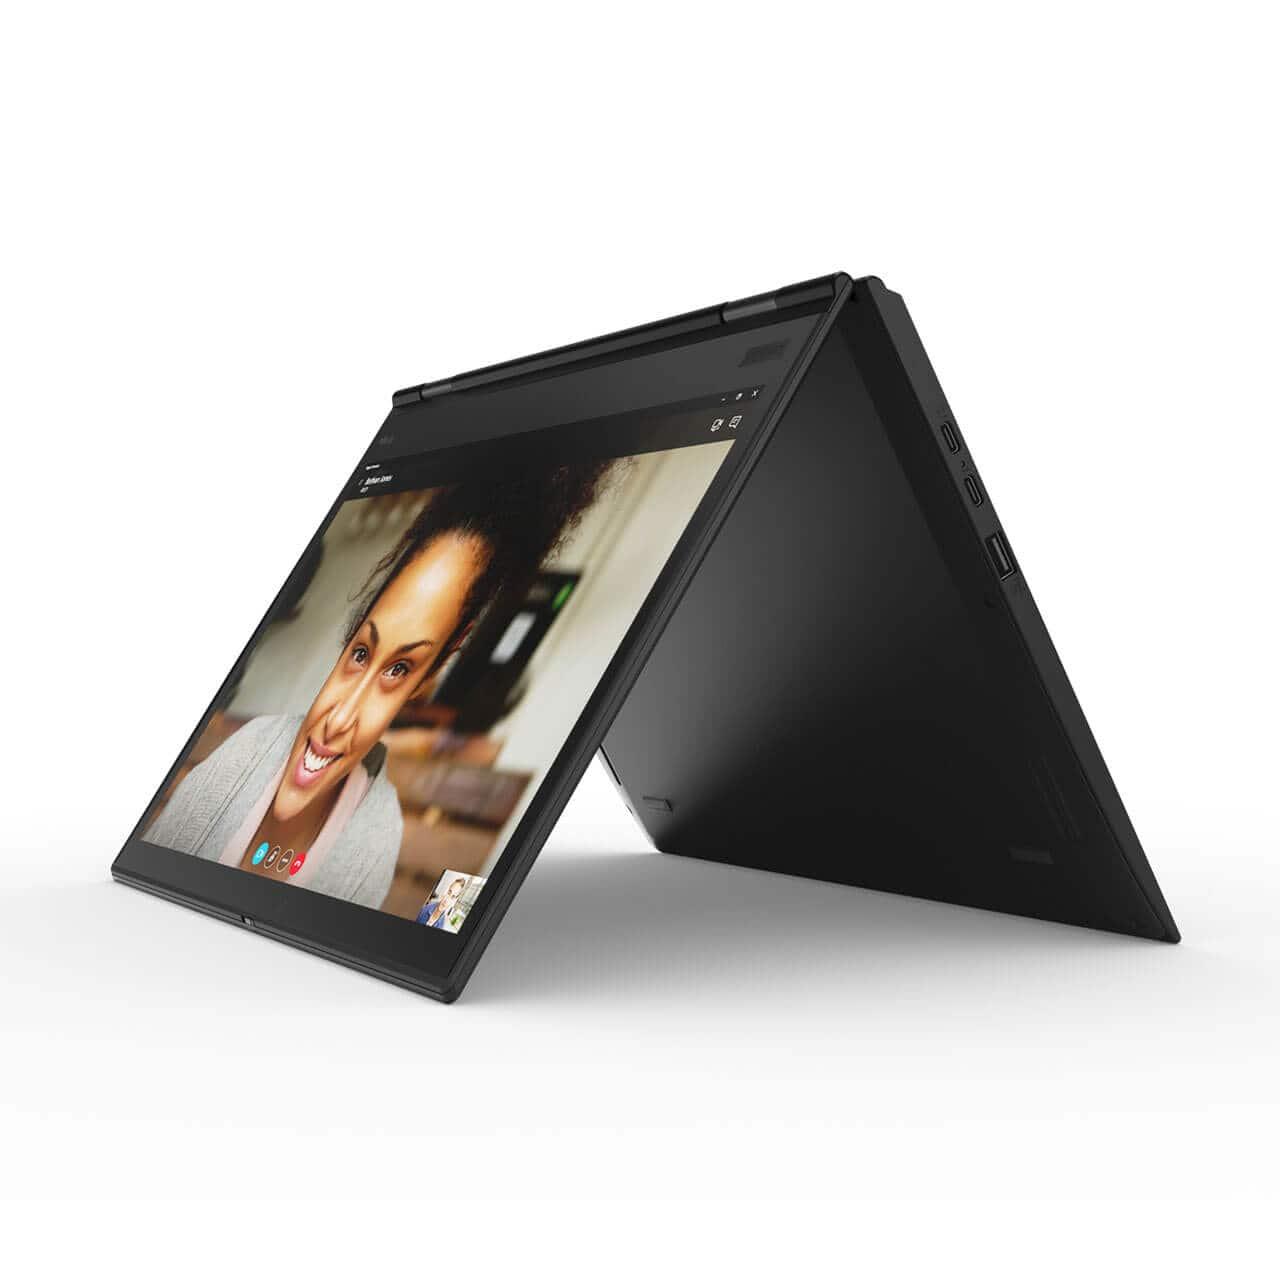 "Lenovo ThinkPad X1 Yoga 3rd Generation, 14.0"", i5-8250U, 8 GB RAM, 512GB SSD, Win 10 Pro 64 2"